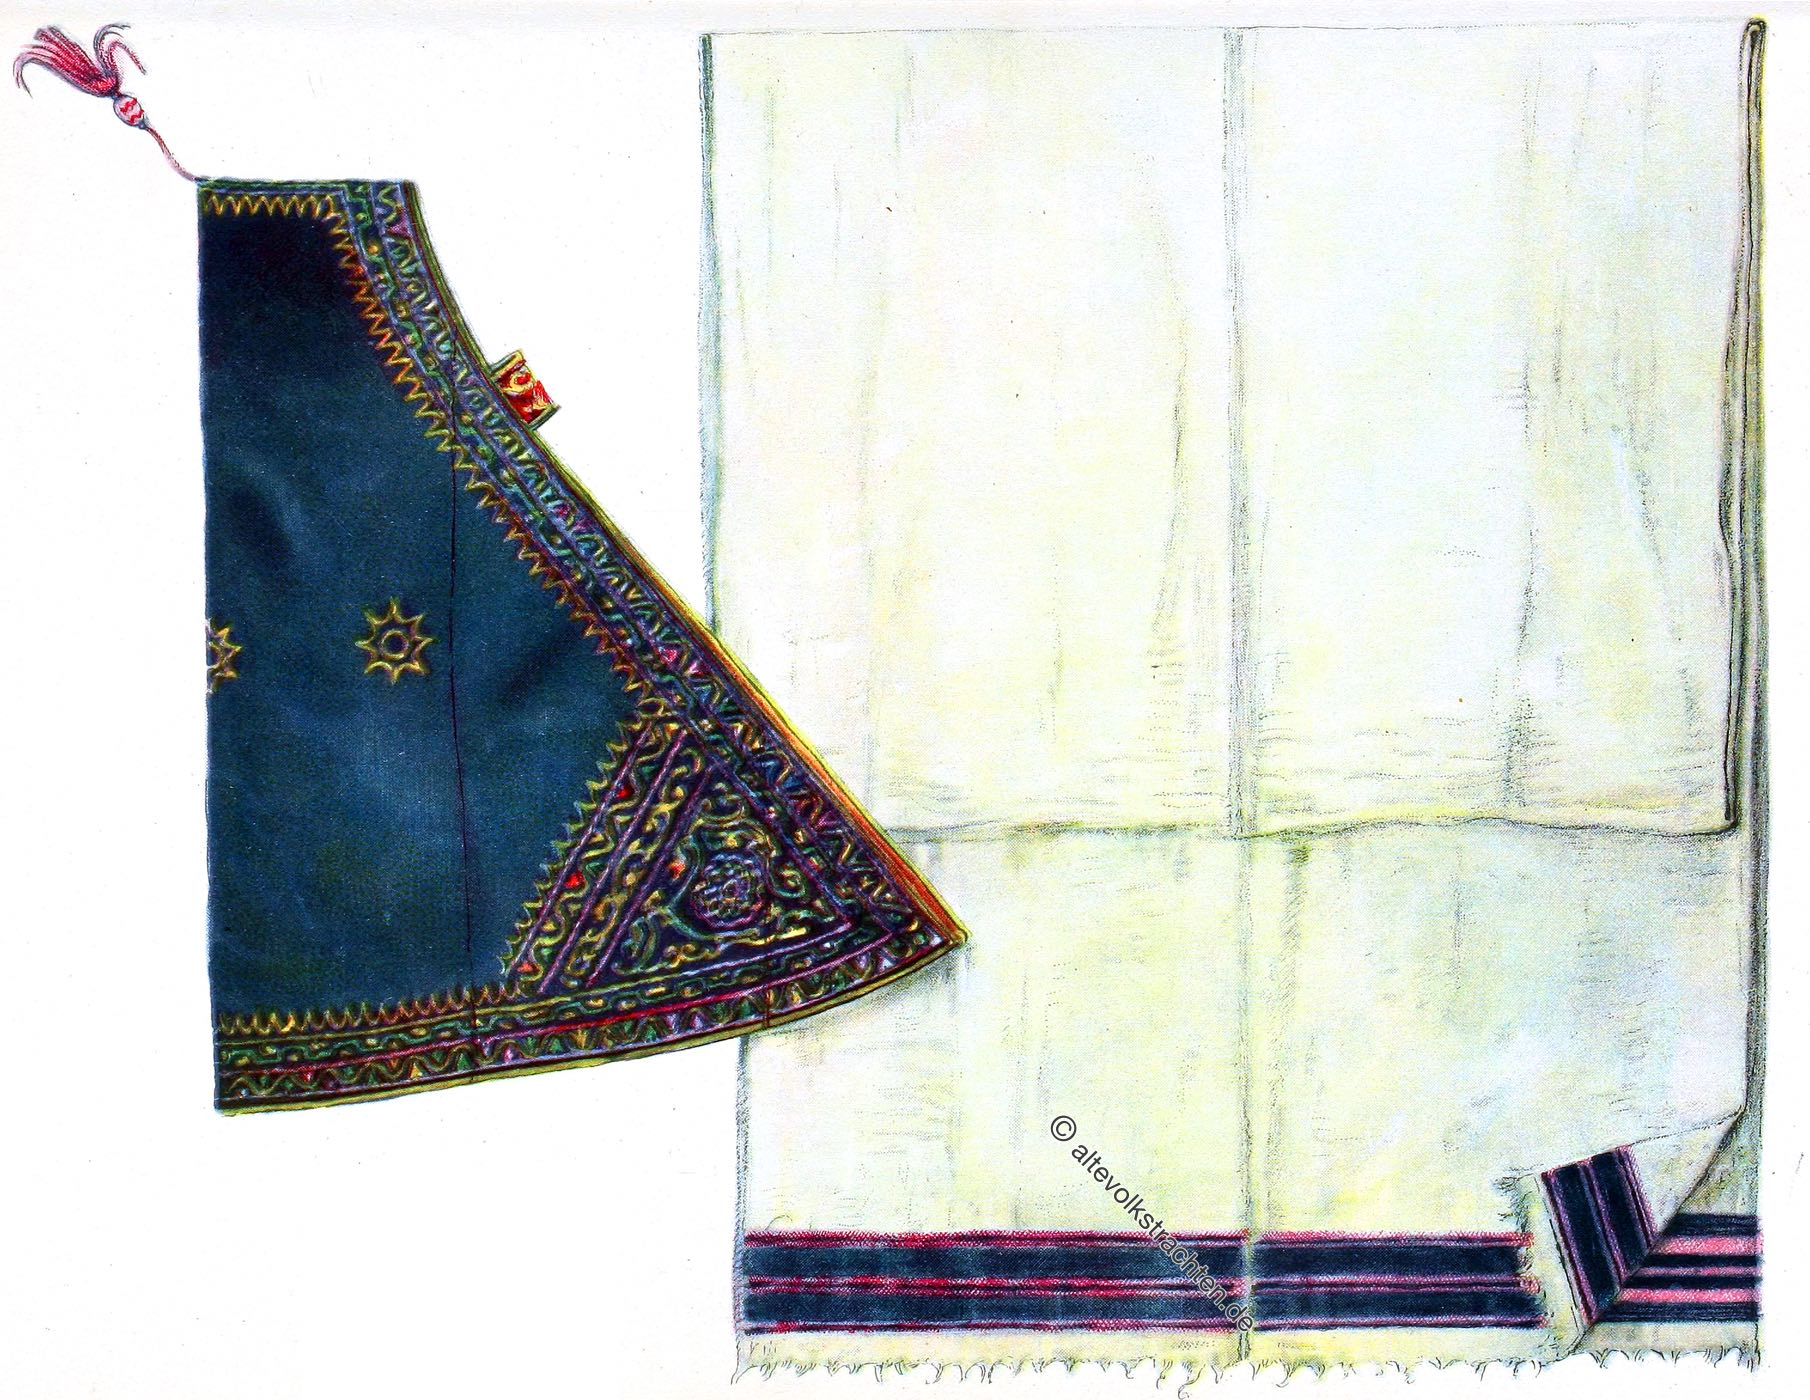 Abyssinia, Shama, hood-cloak, africa, costume